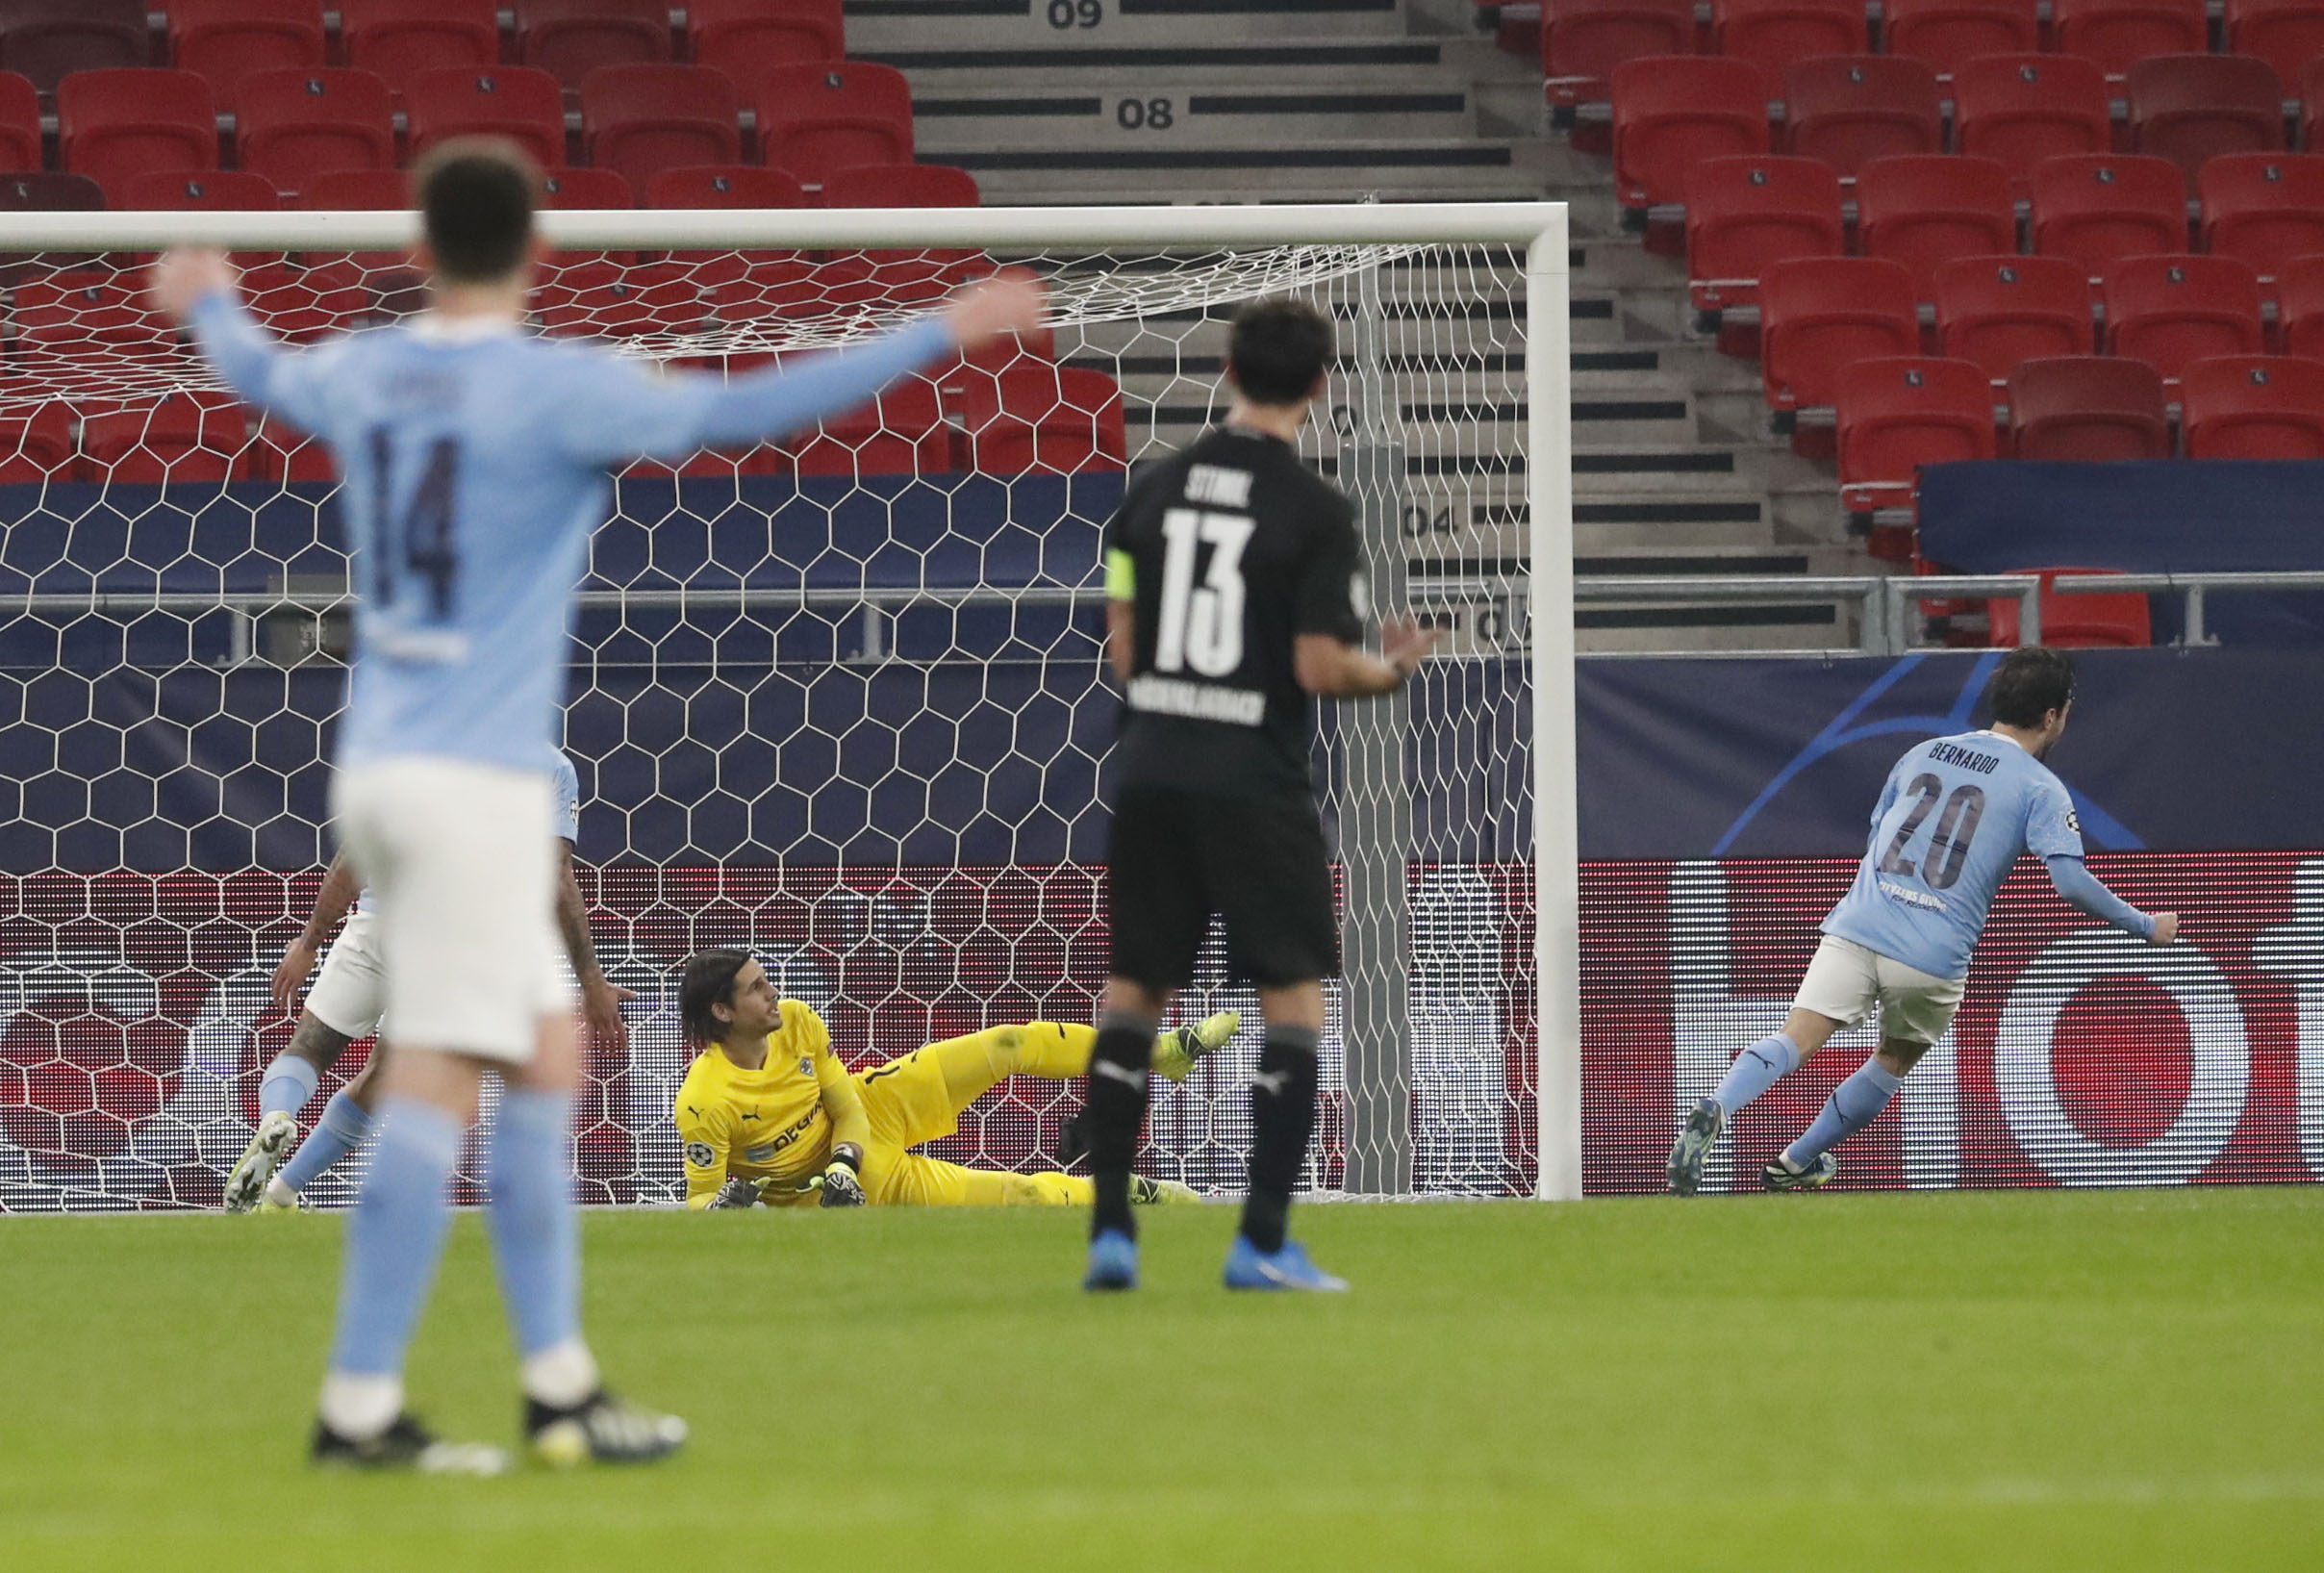 Champions League ΤΕΛΙΚΑ: Αταλάντα – Ρεάλ Μαδρίτης 0-1, Γκλάντμπαχ – Μάντσεστερ Σίτι 0-2